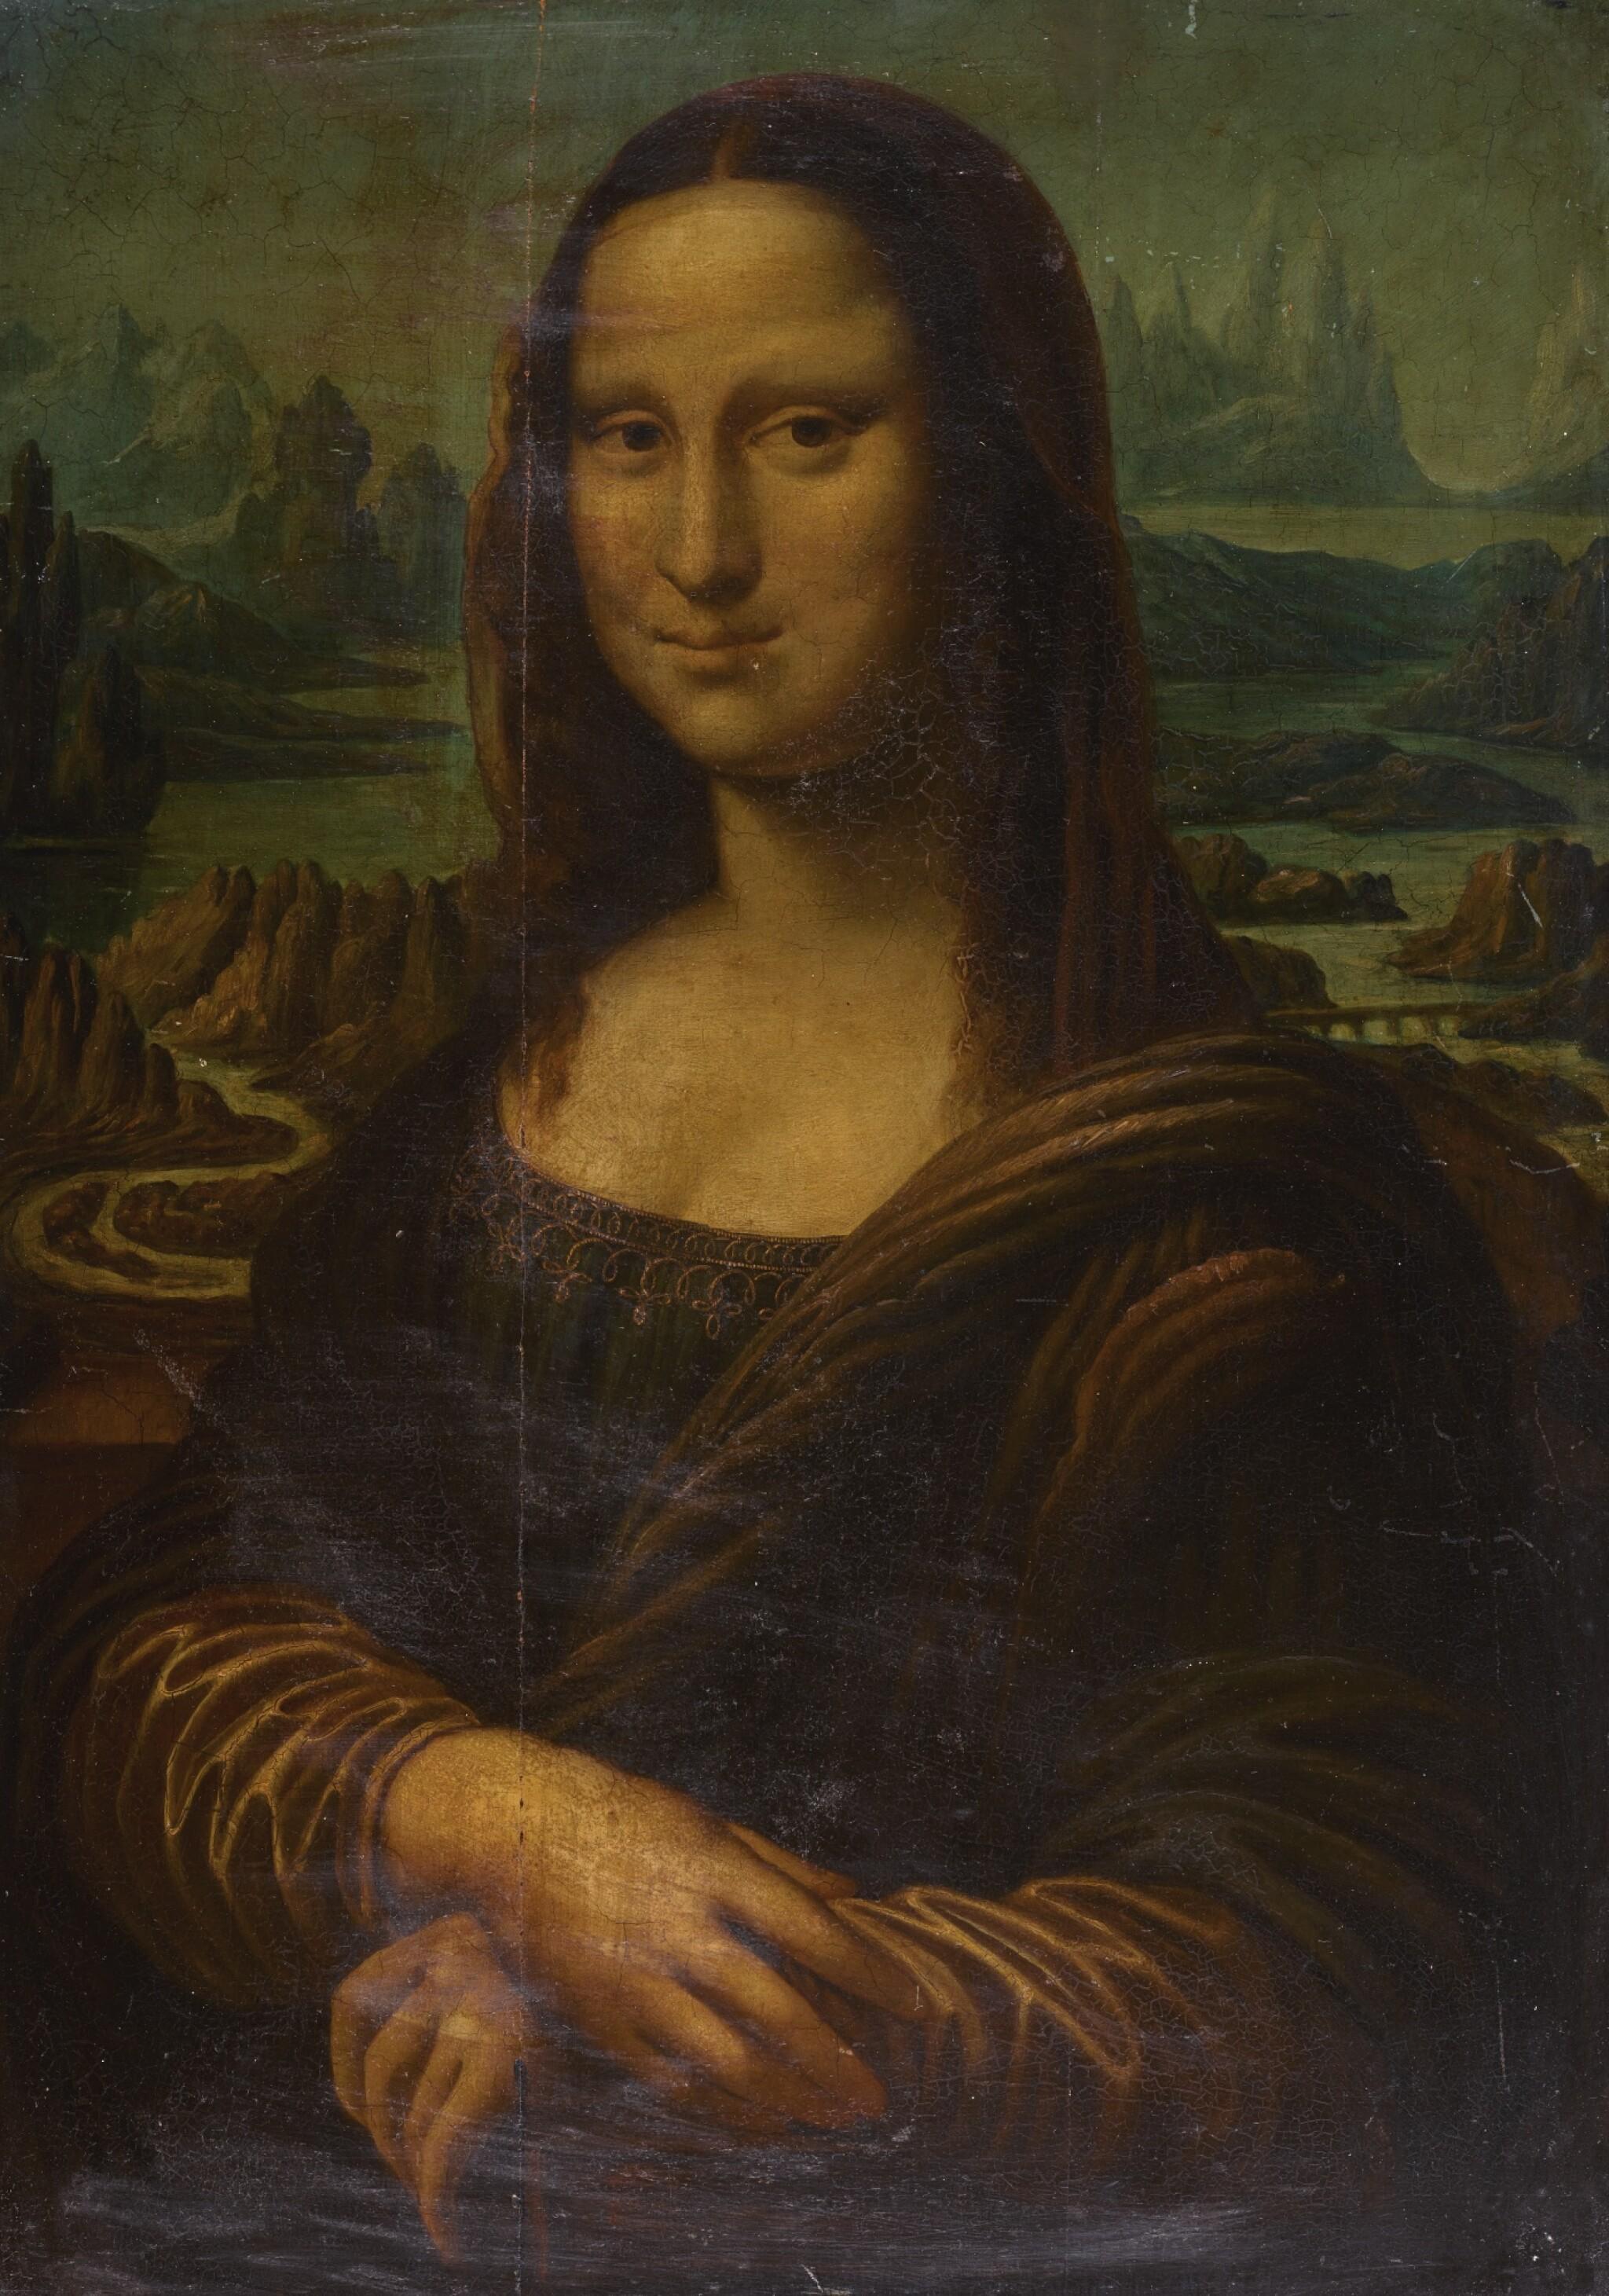 FOLLOWER OF LEONARDO DA VINCI, 19TH CENTURY | Mona Lisa